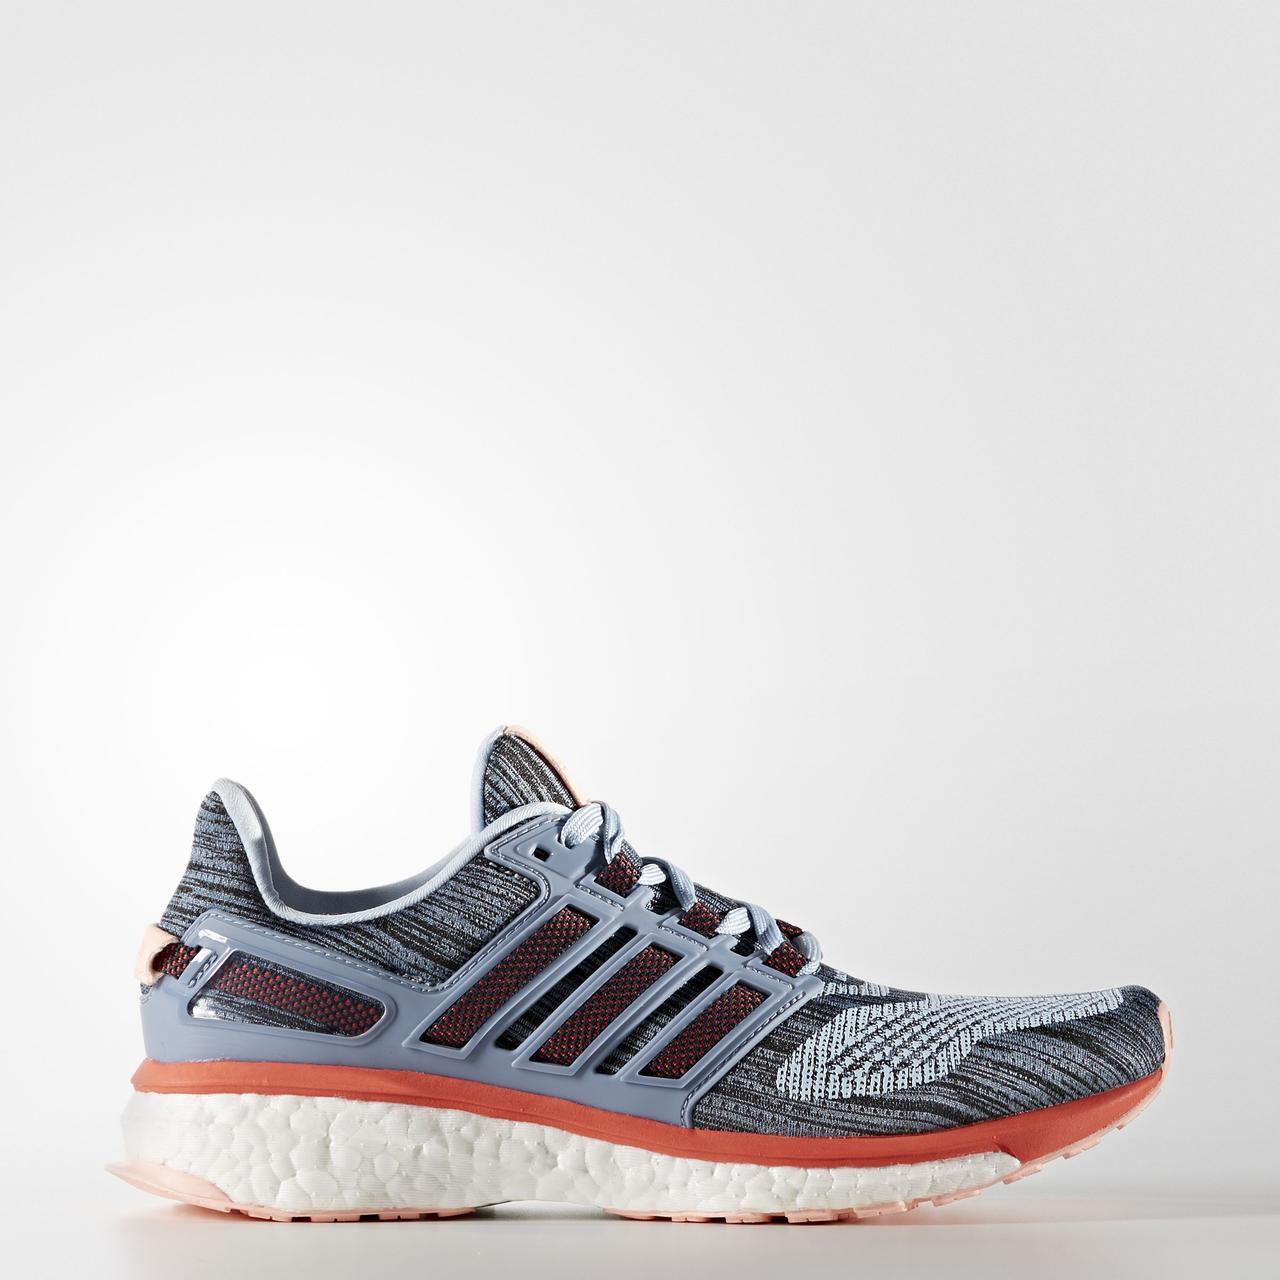 3cf80b7e6e92 Женские Кроссовки Adidas Energy Boost 3 BB5791  продажа, цена в ...